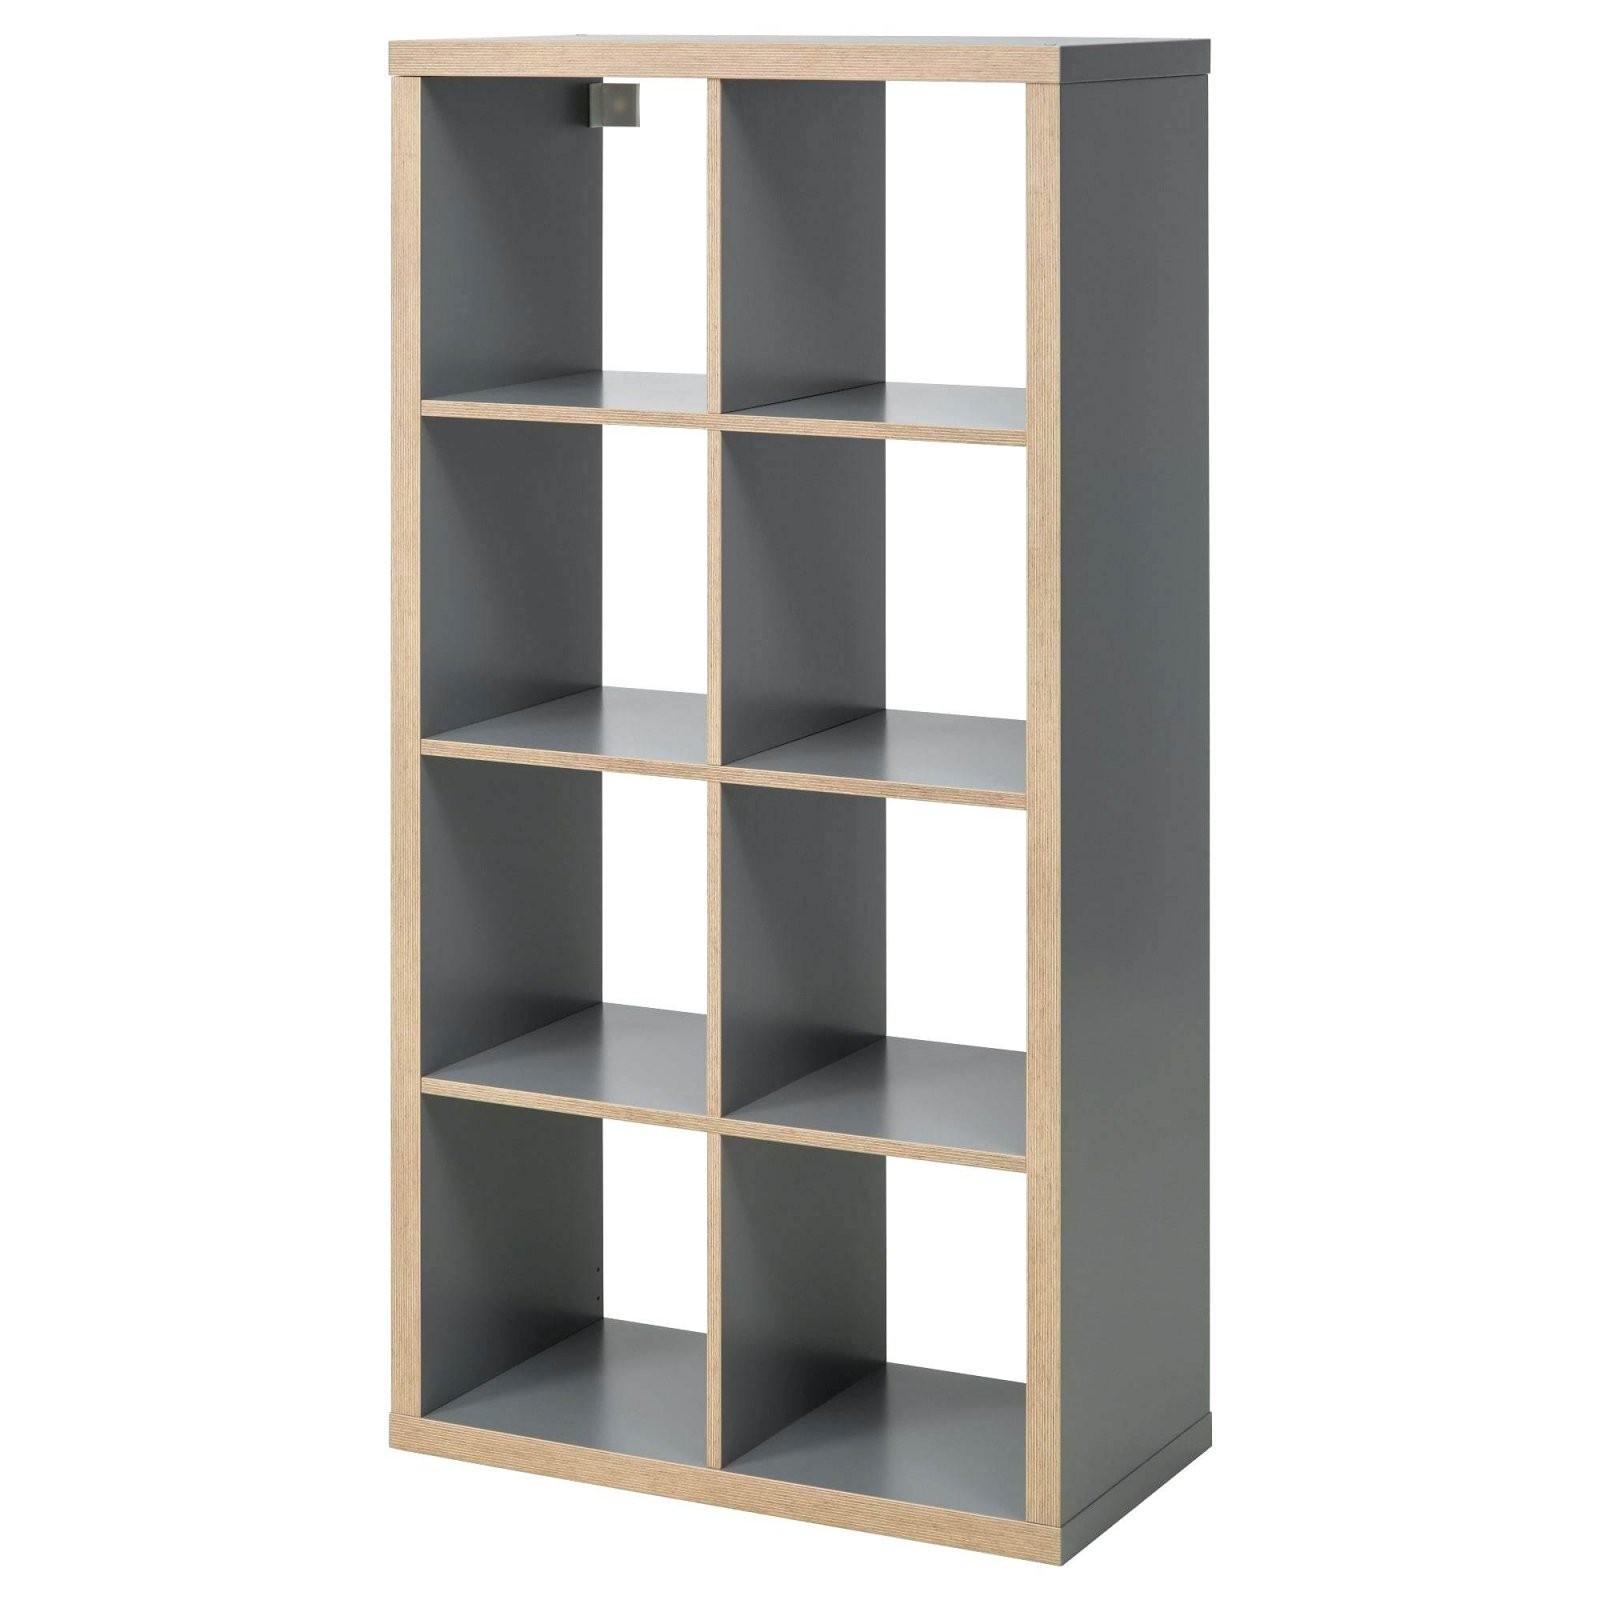 Regal Grau Ikea – Lyonsmeatsmn von Ikea Regal Metall Glas Bild